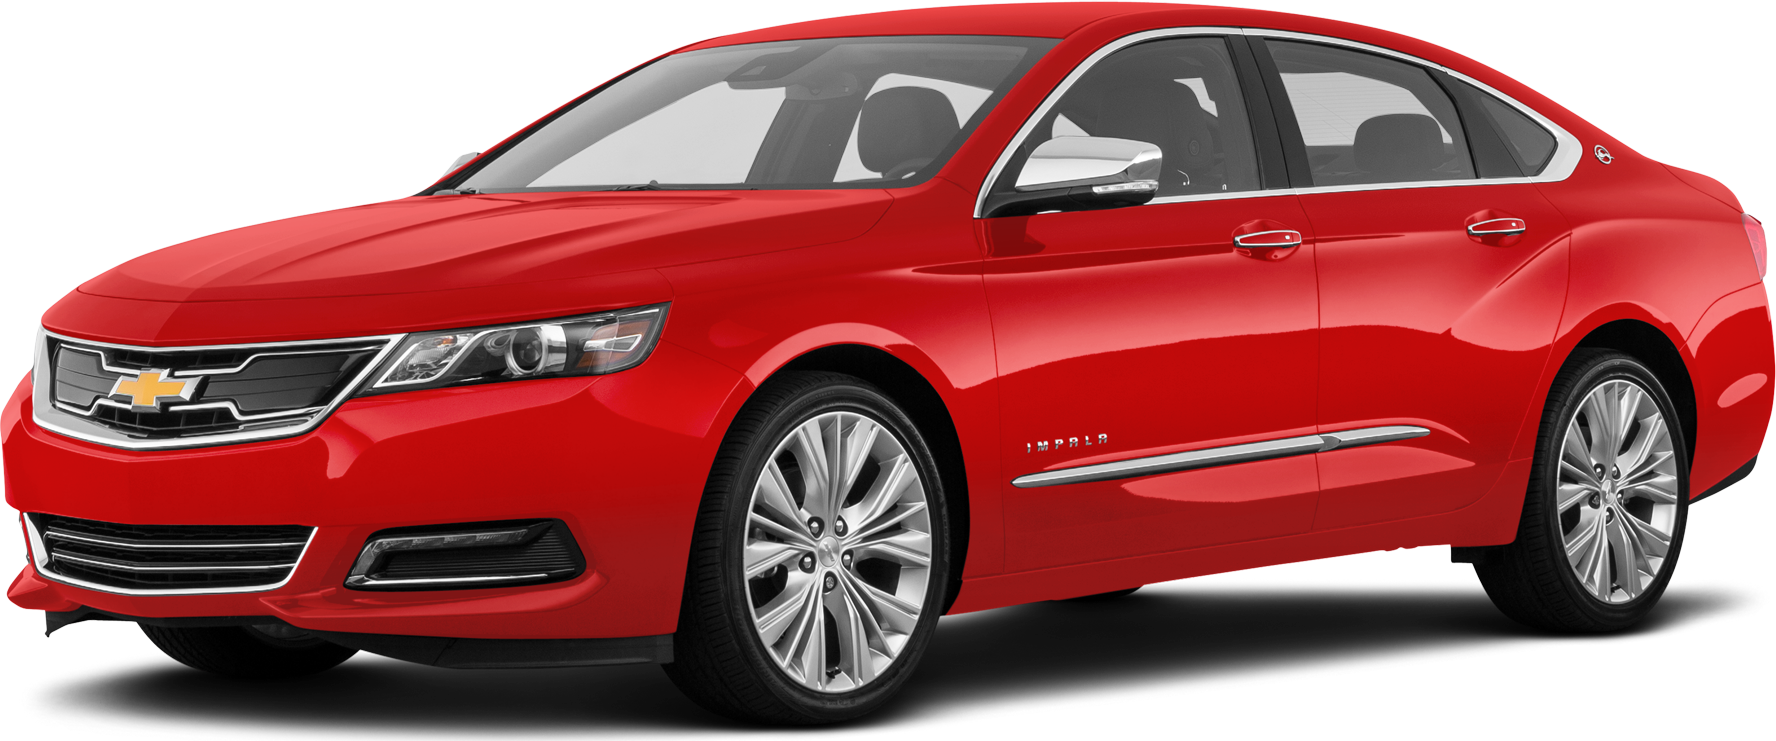 2020 Chevrolet Impala Reviews Pricing Specs Kelley Blue Book